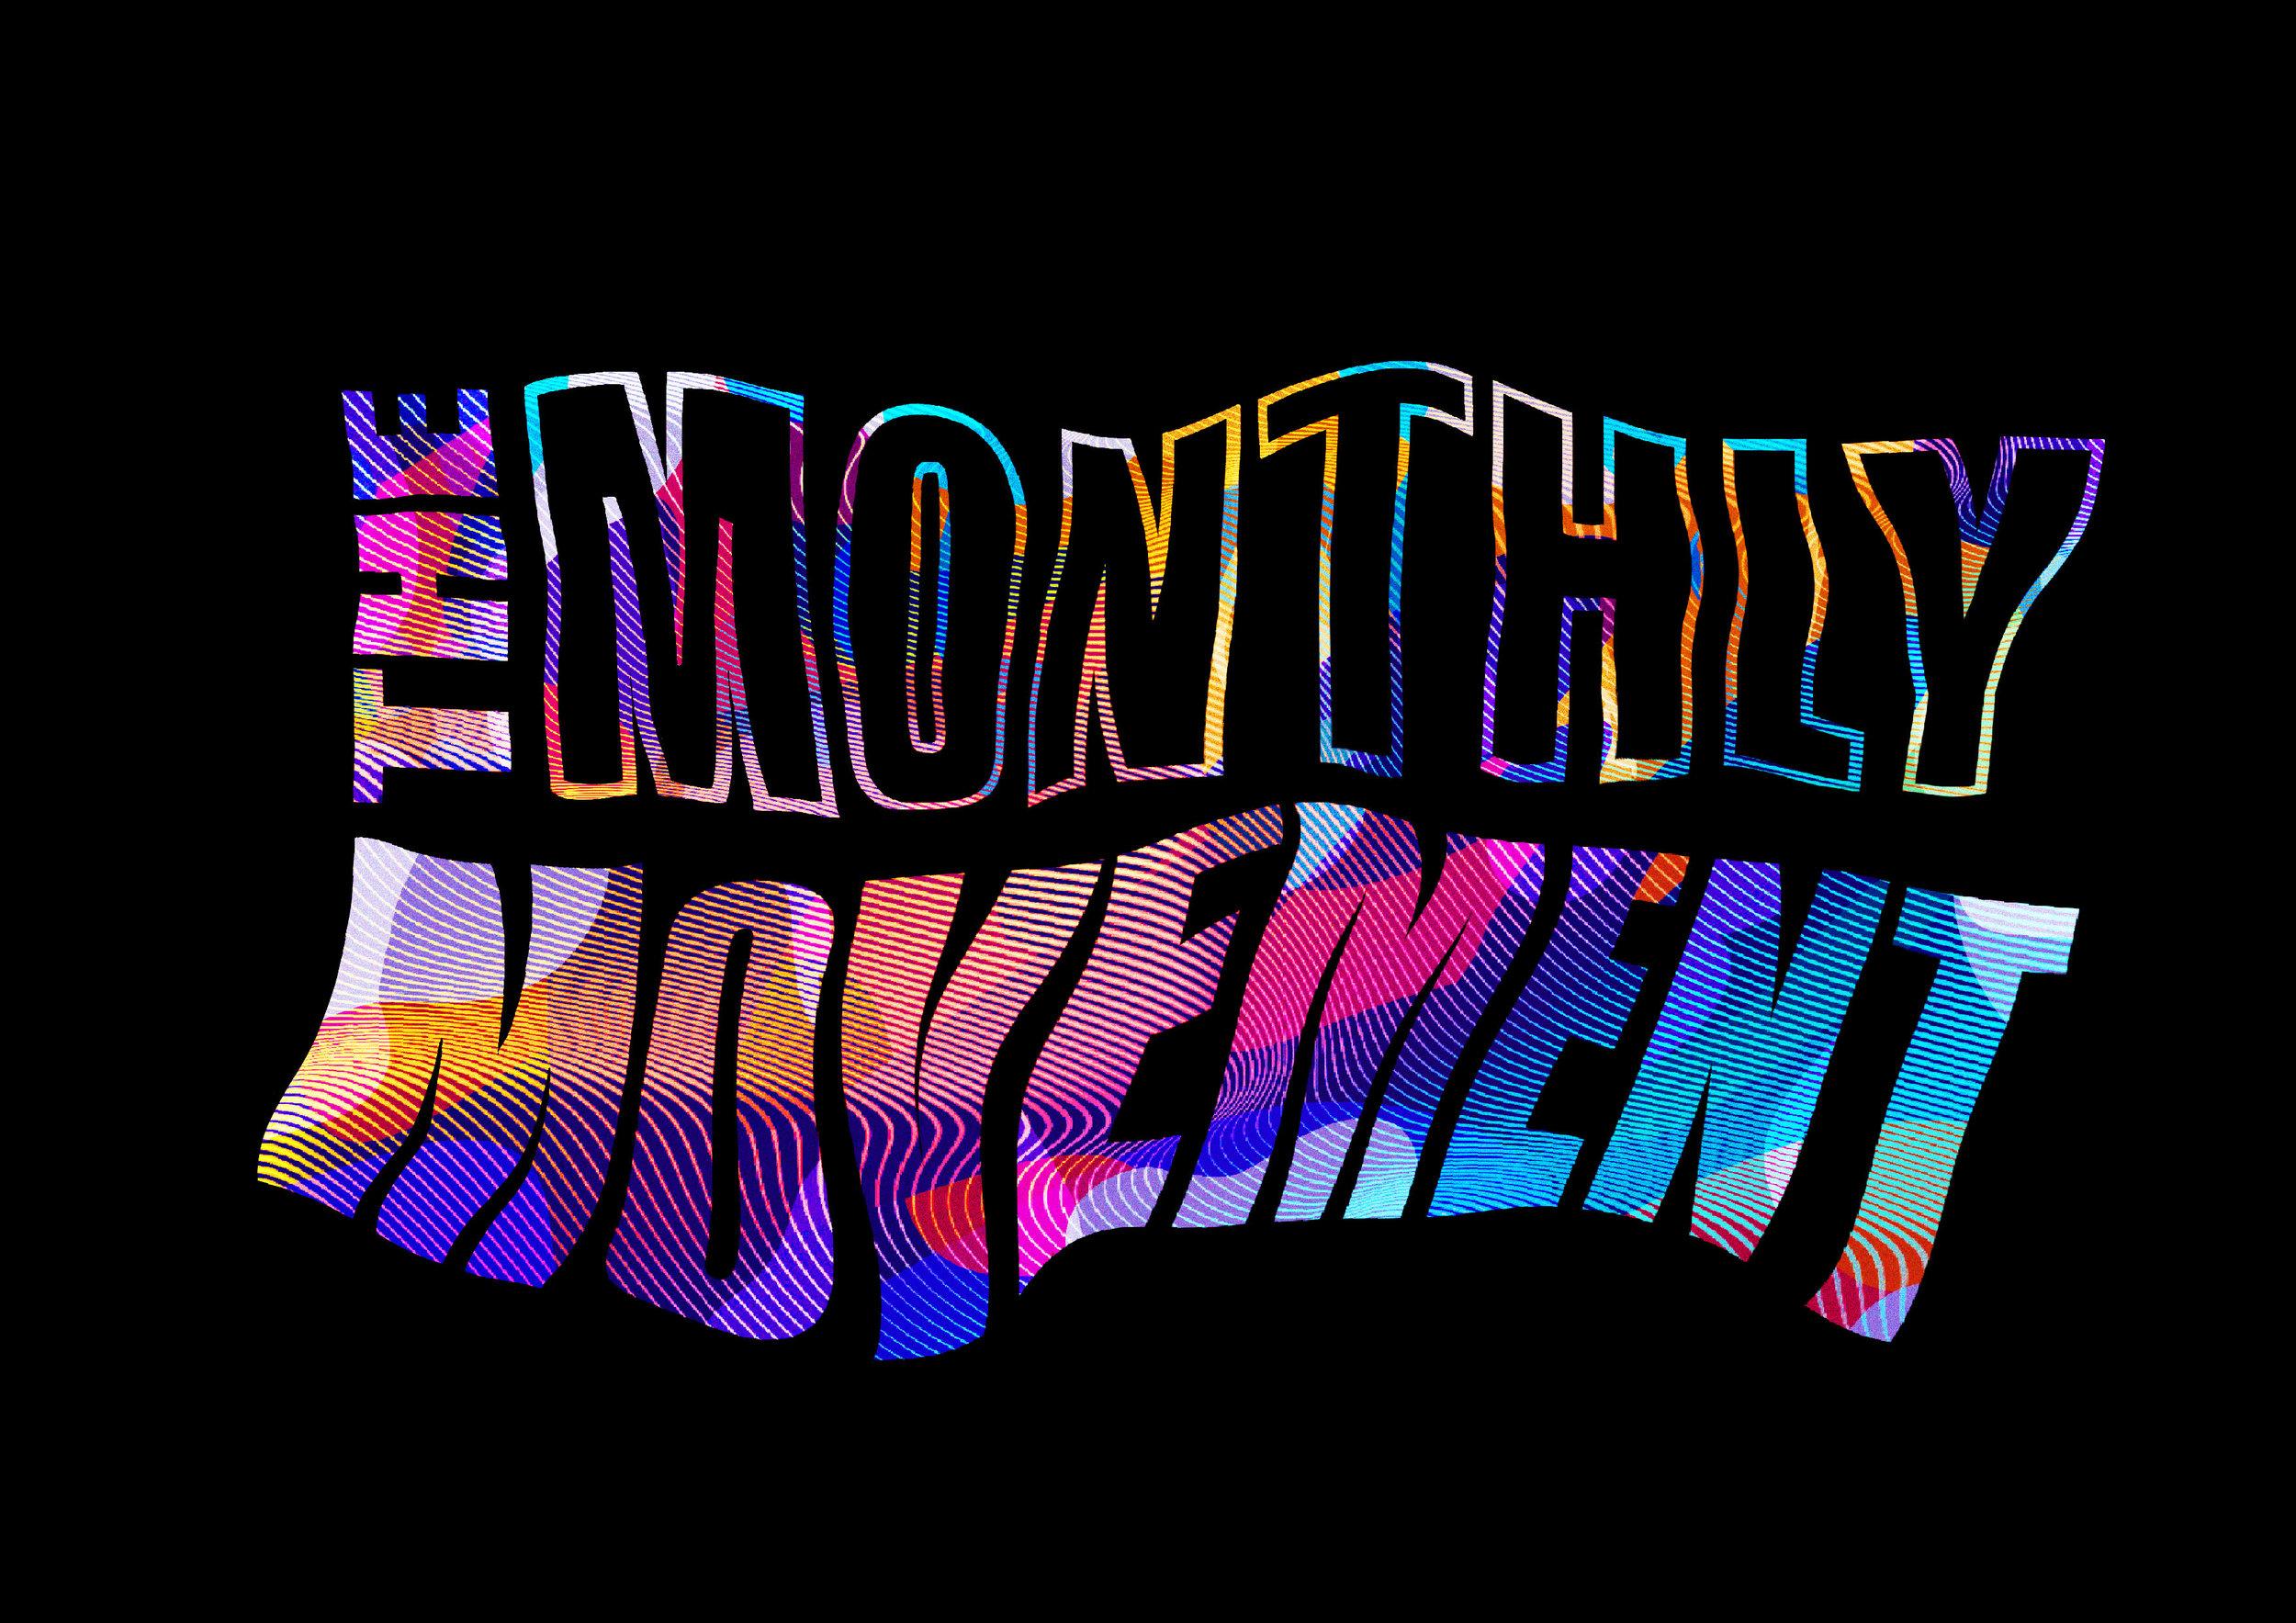 1 Monthly movements treatments_GCASFM.jpg